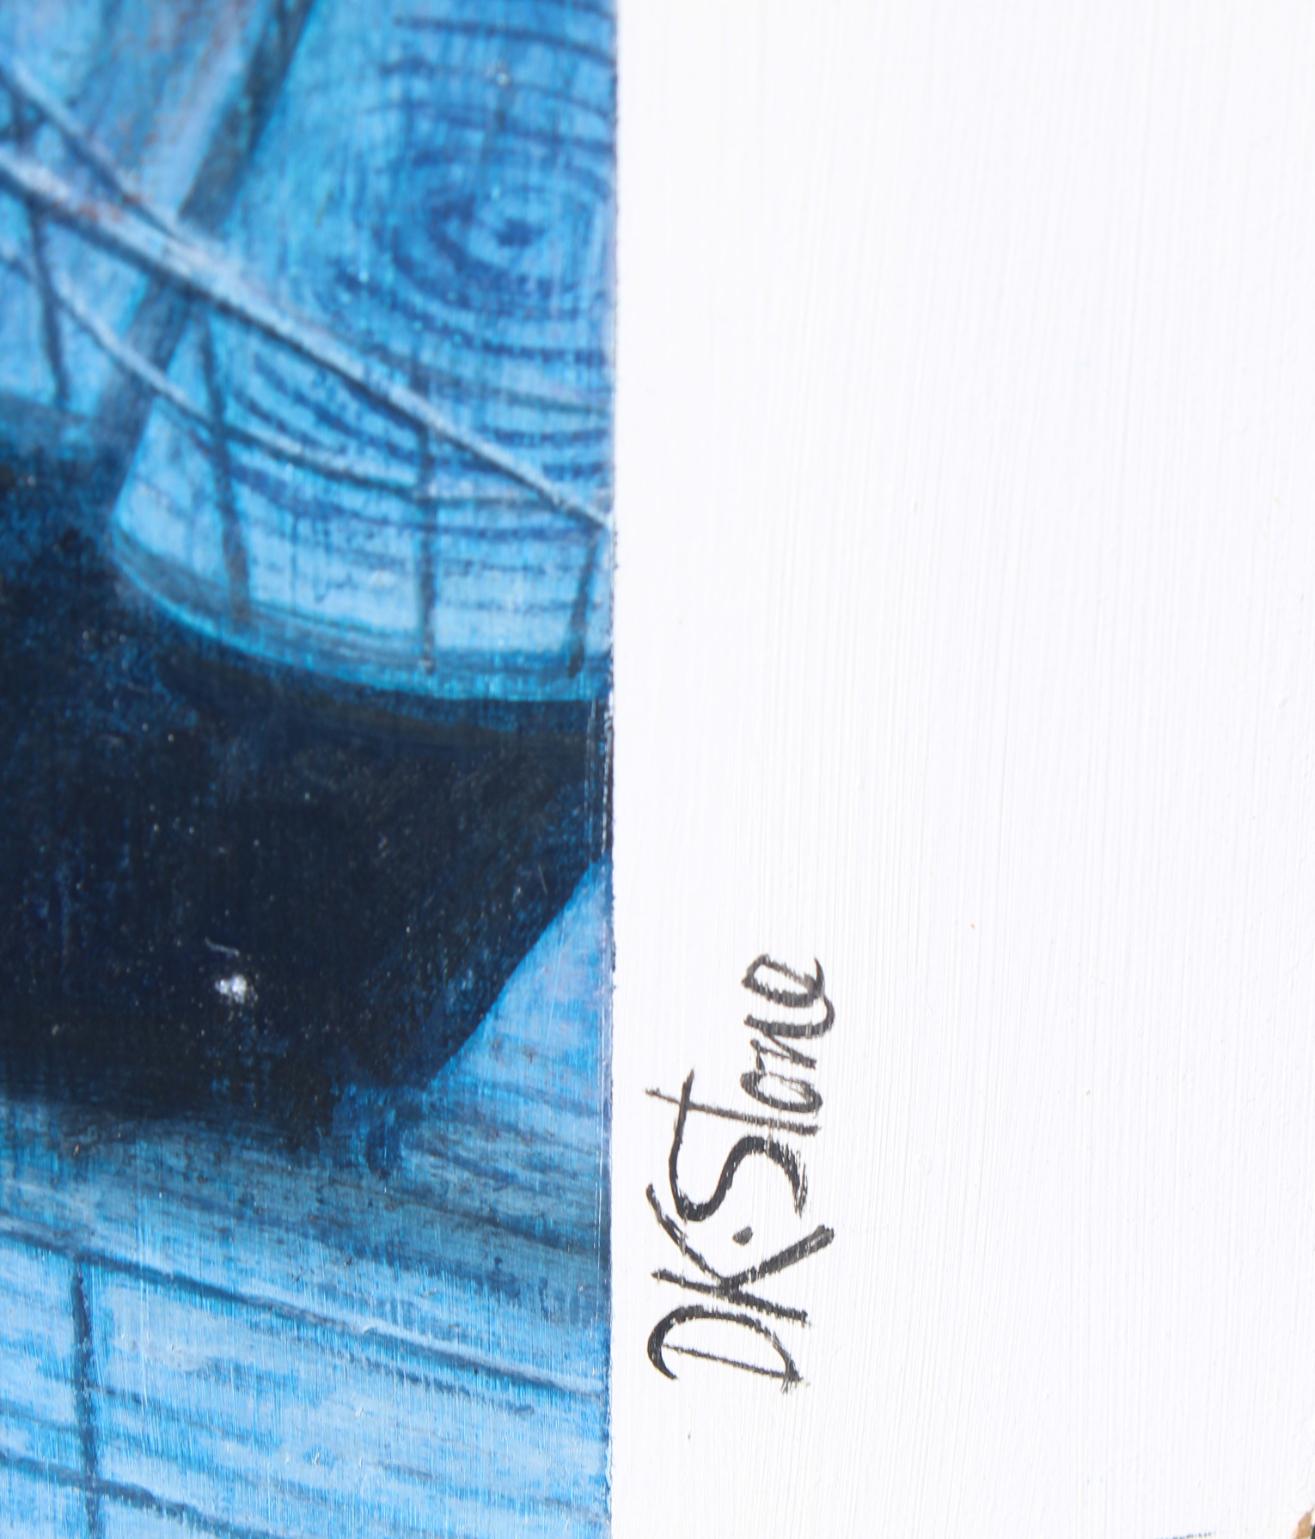 David K. Stone (1922 - 2001) USS Reuben James Sunk - Image 3 of 4